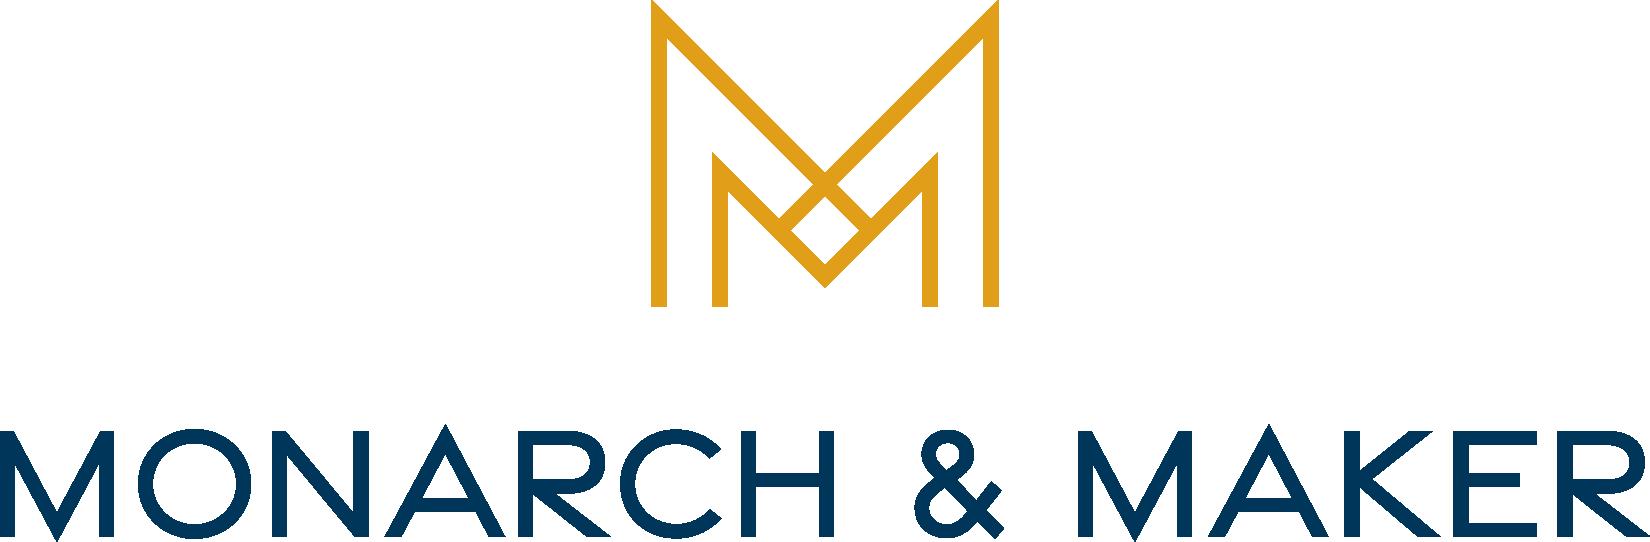 Monarch & Maker - Interior Designs logo